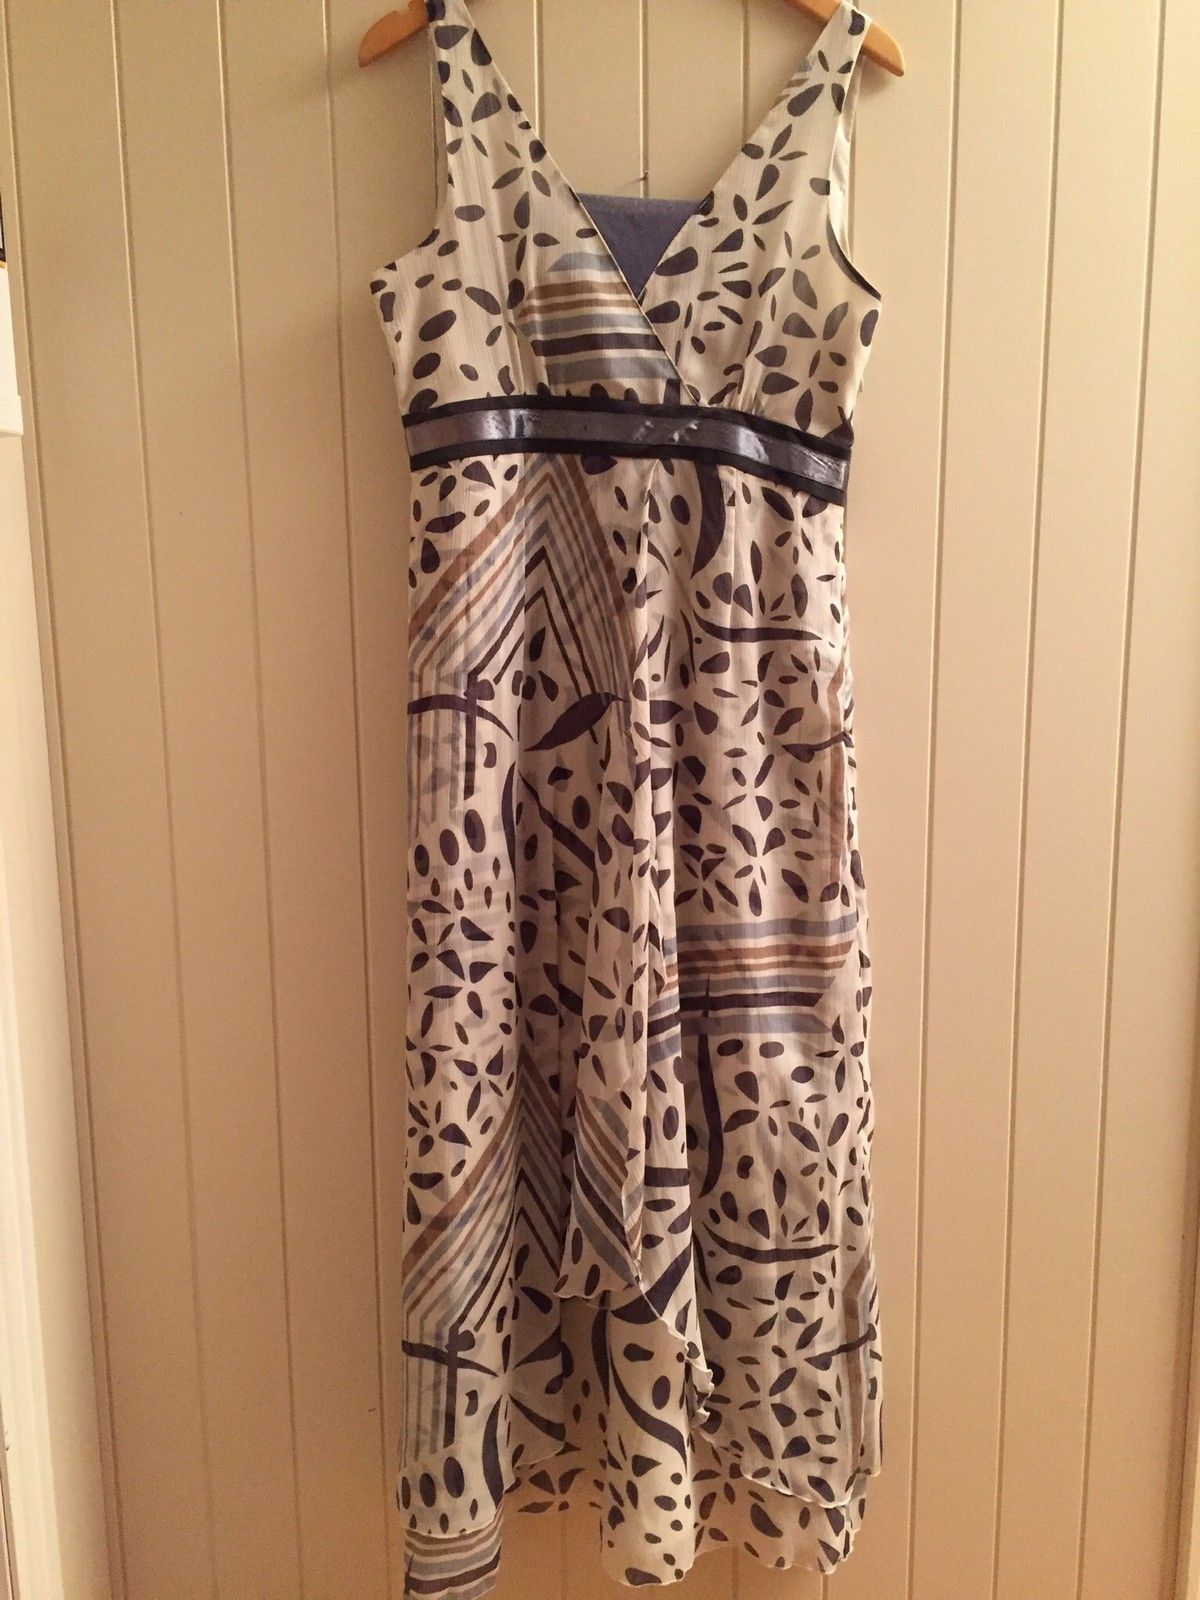 00af5532 Fin kjole ti 17 mai med ubrukt Tara jakke | FINN.no